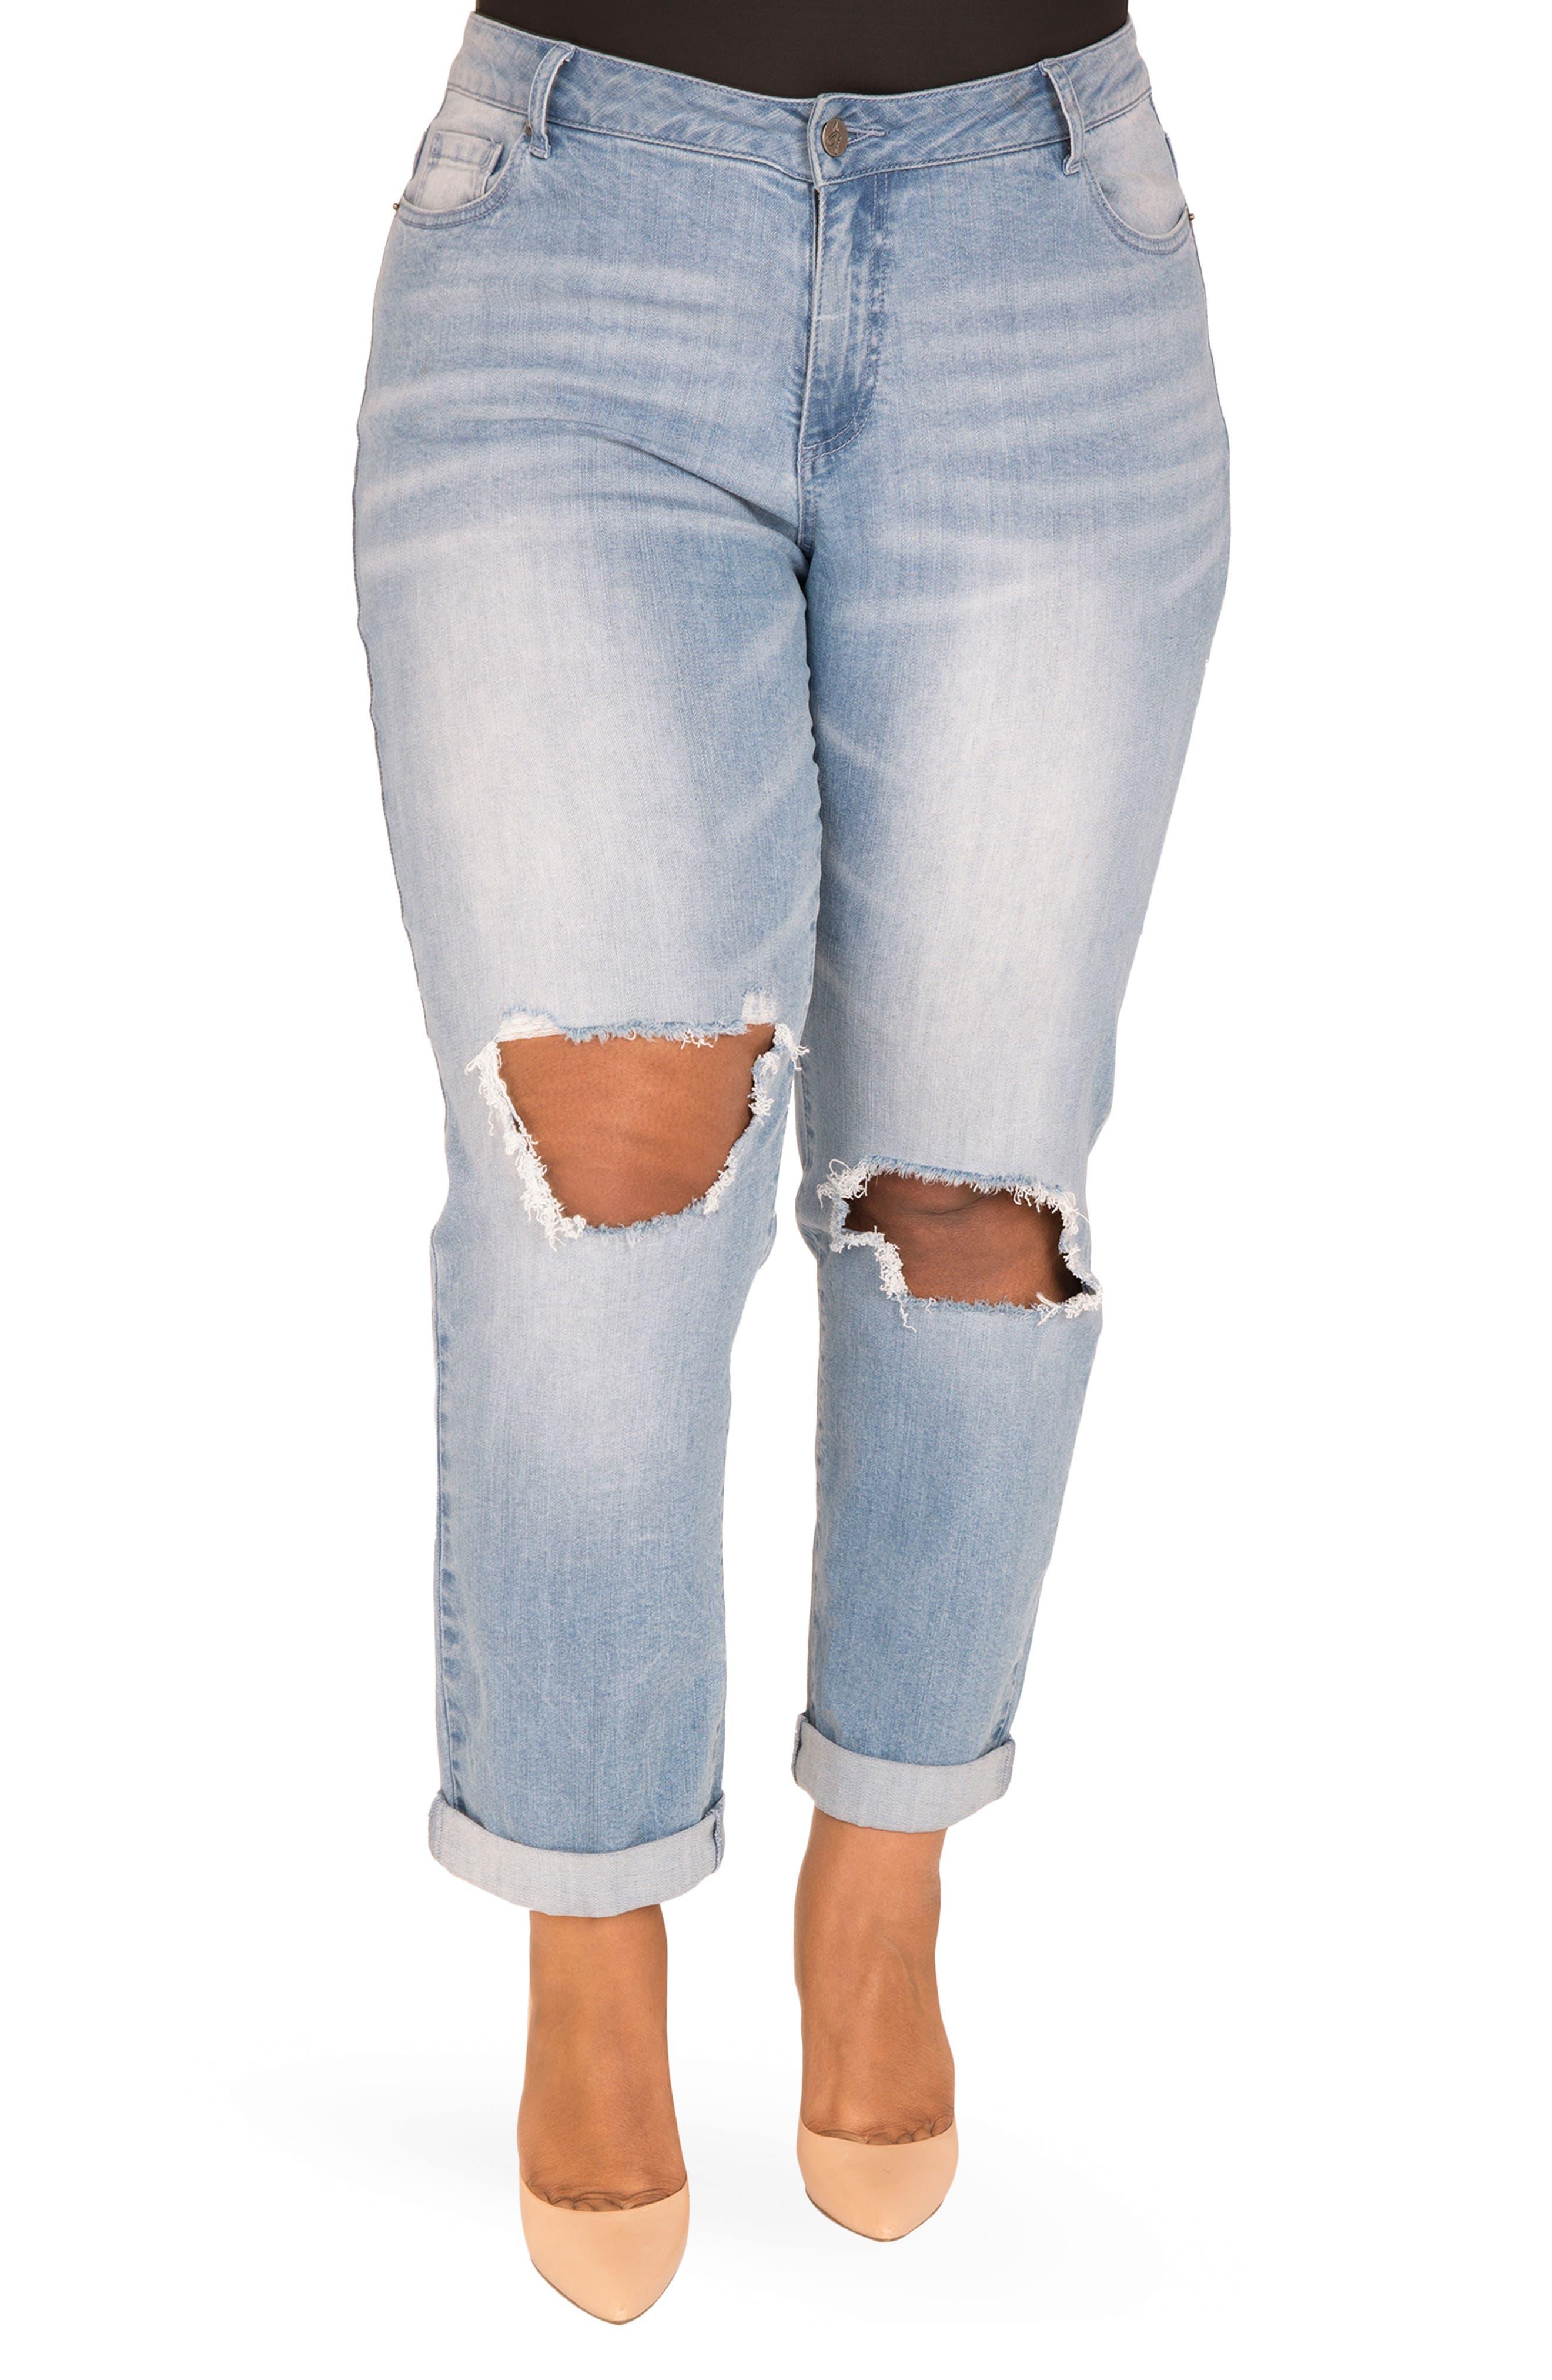 Verla Destroyed Boyfriend Jeans,                         Main,                         color, Light Blue